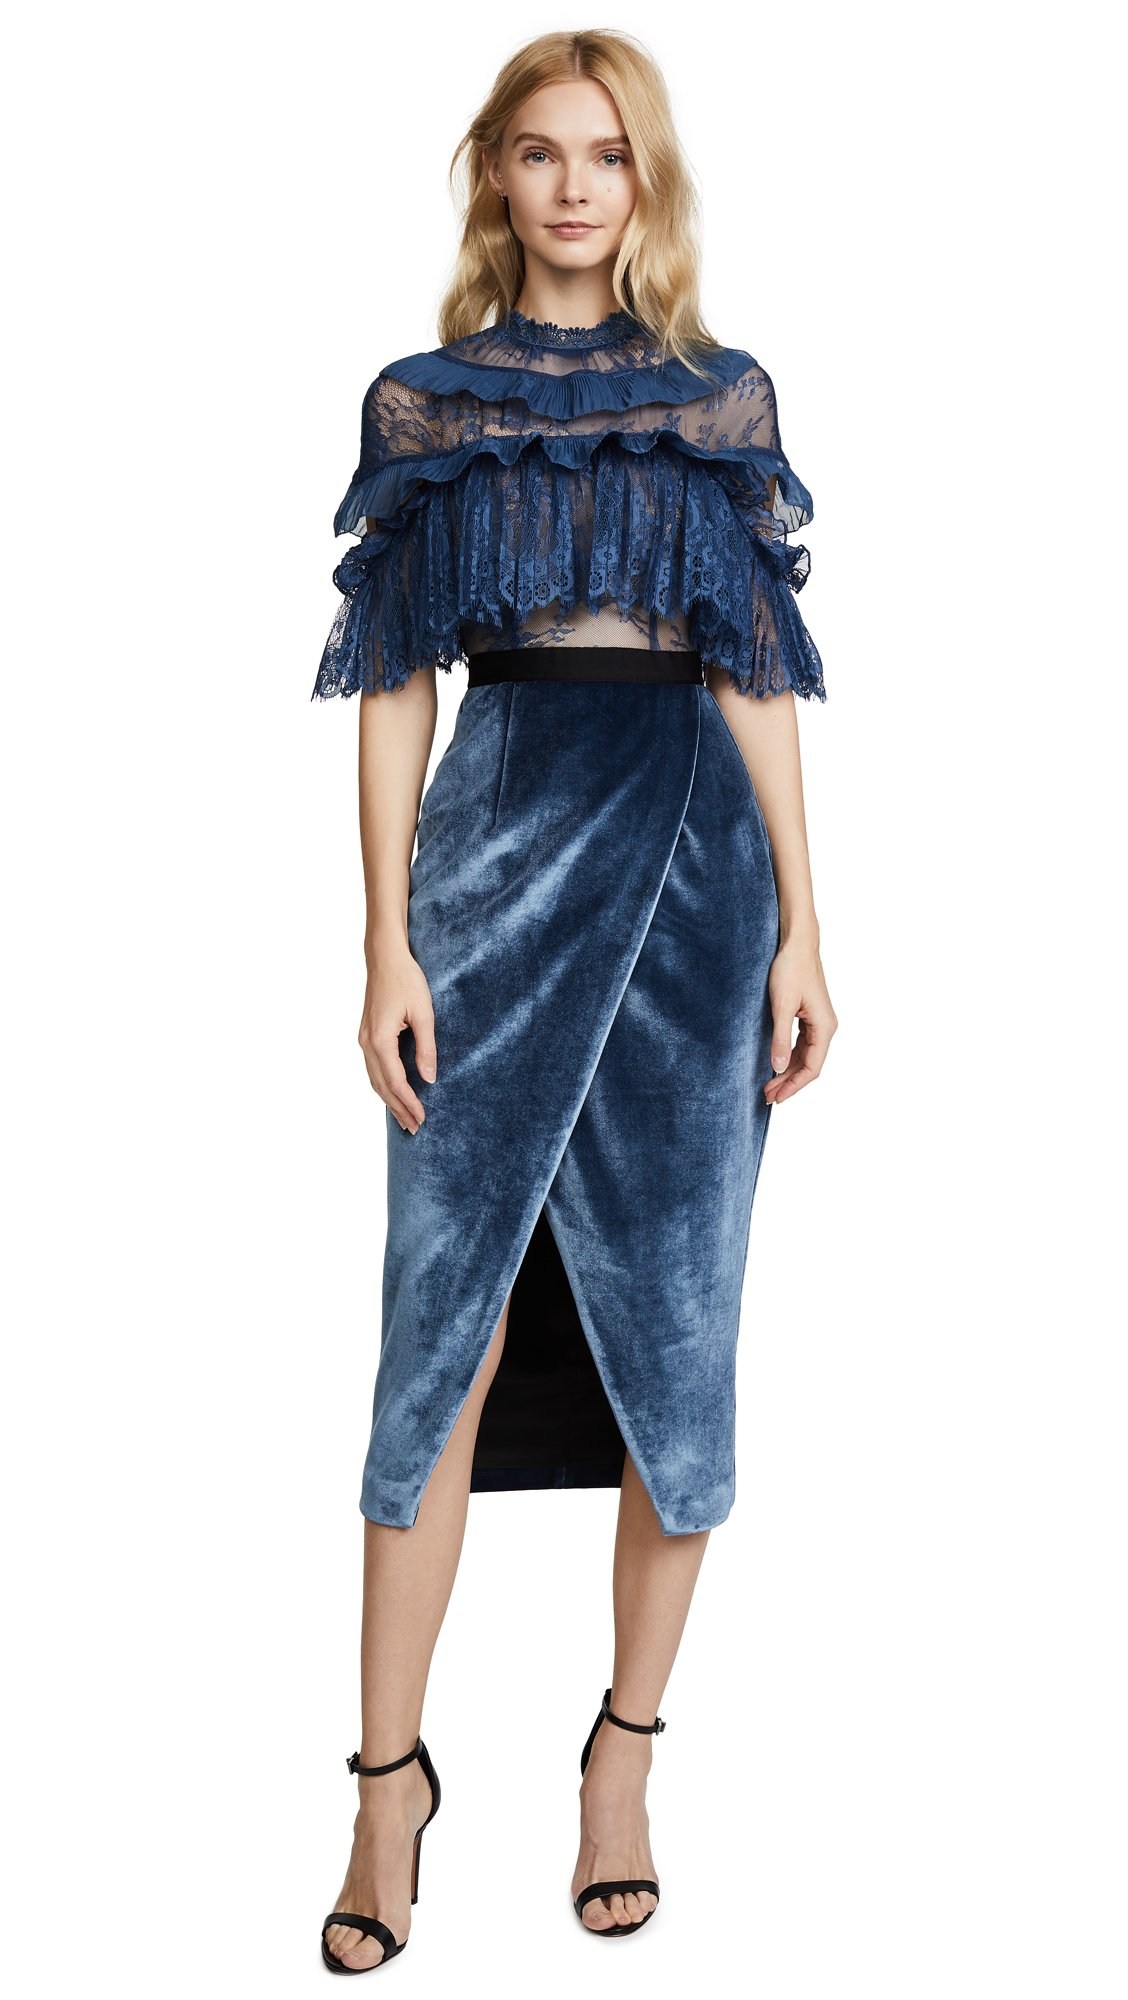 Self Portrait Women's Fine Lace Dress, Dusky Blue, 4